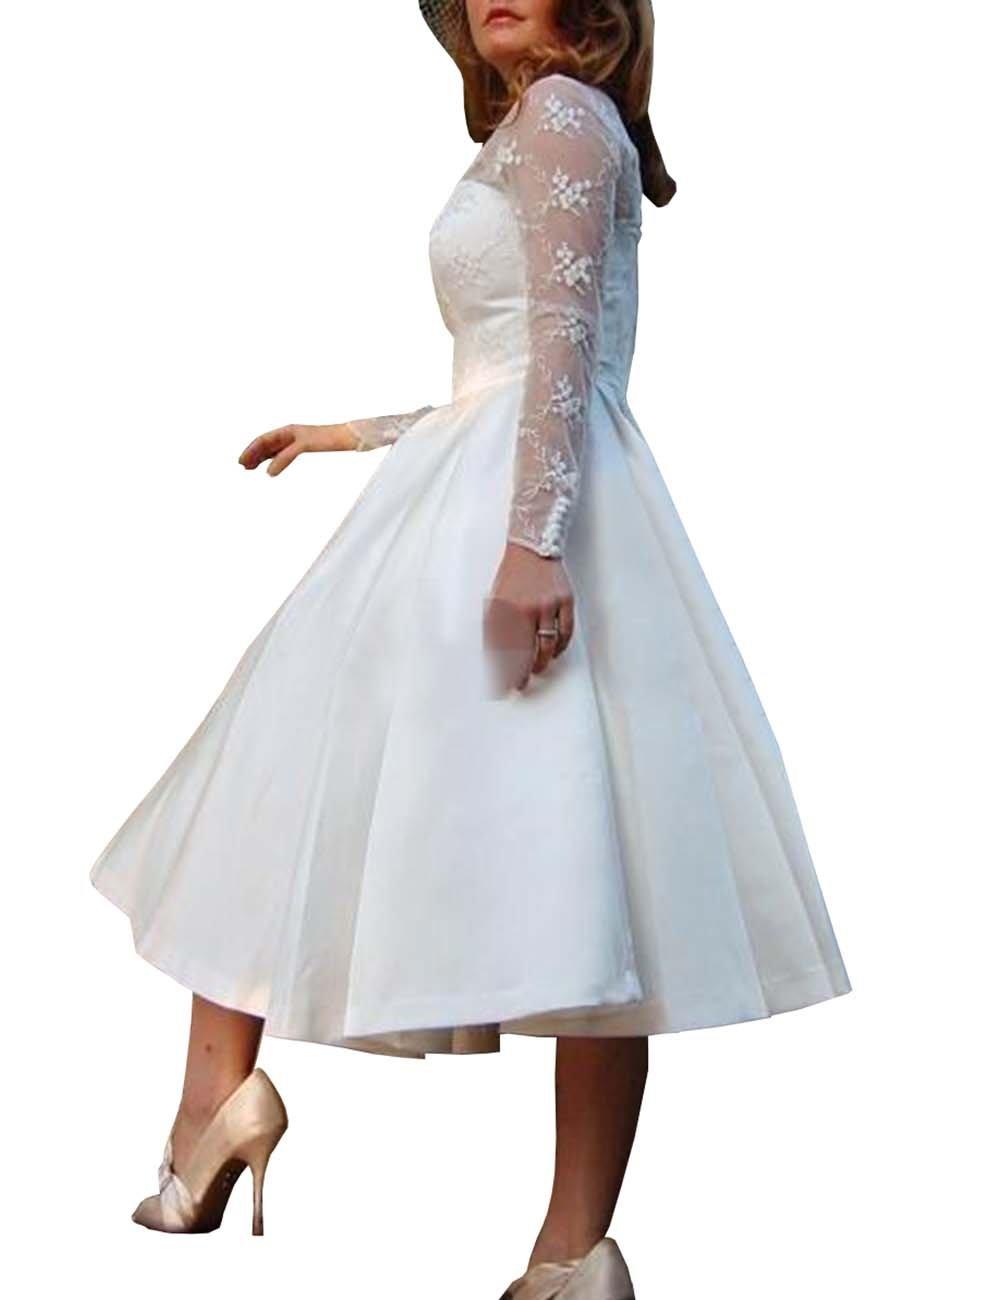 Mulanbridal Women\'s V Neck Long Sleeves Tea Length Short Wedding Dress  Satin Plus Size Bridal Gowns White 14